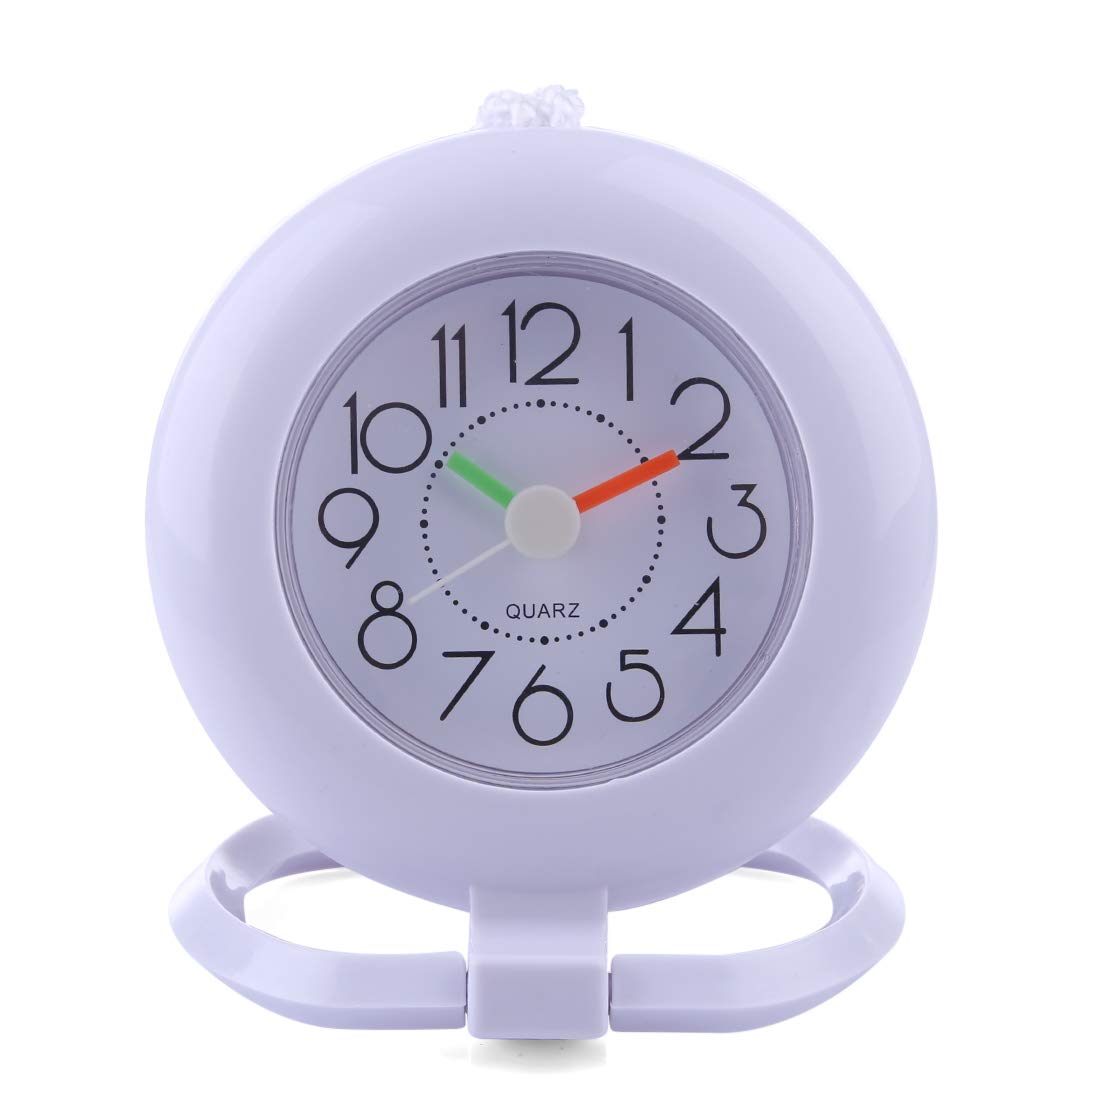 ZUJI Horloge Murale Silencieuse pour Salle de Bain Petit Pendule Murale Blanc